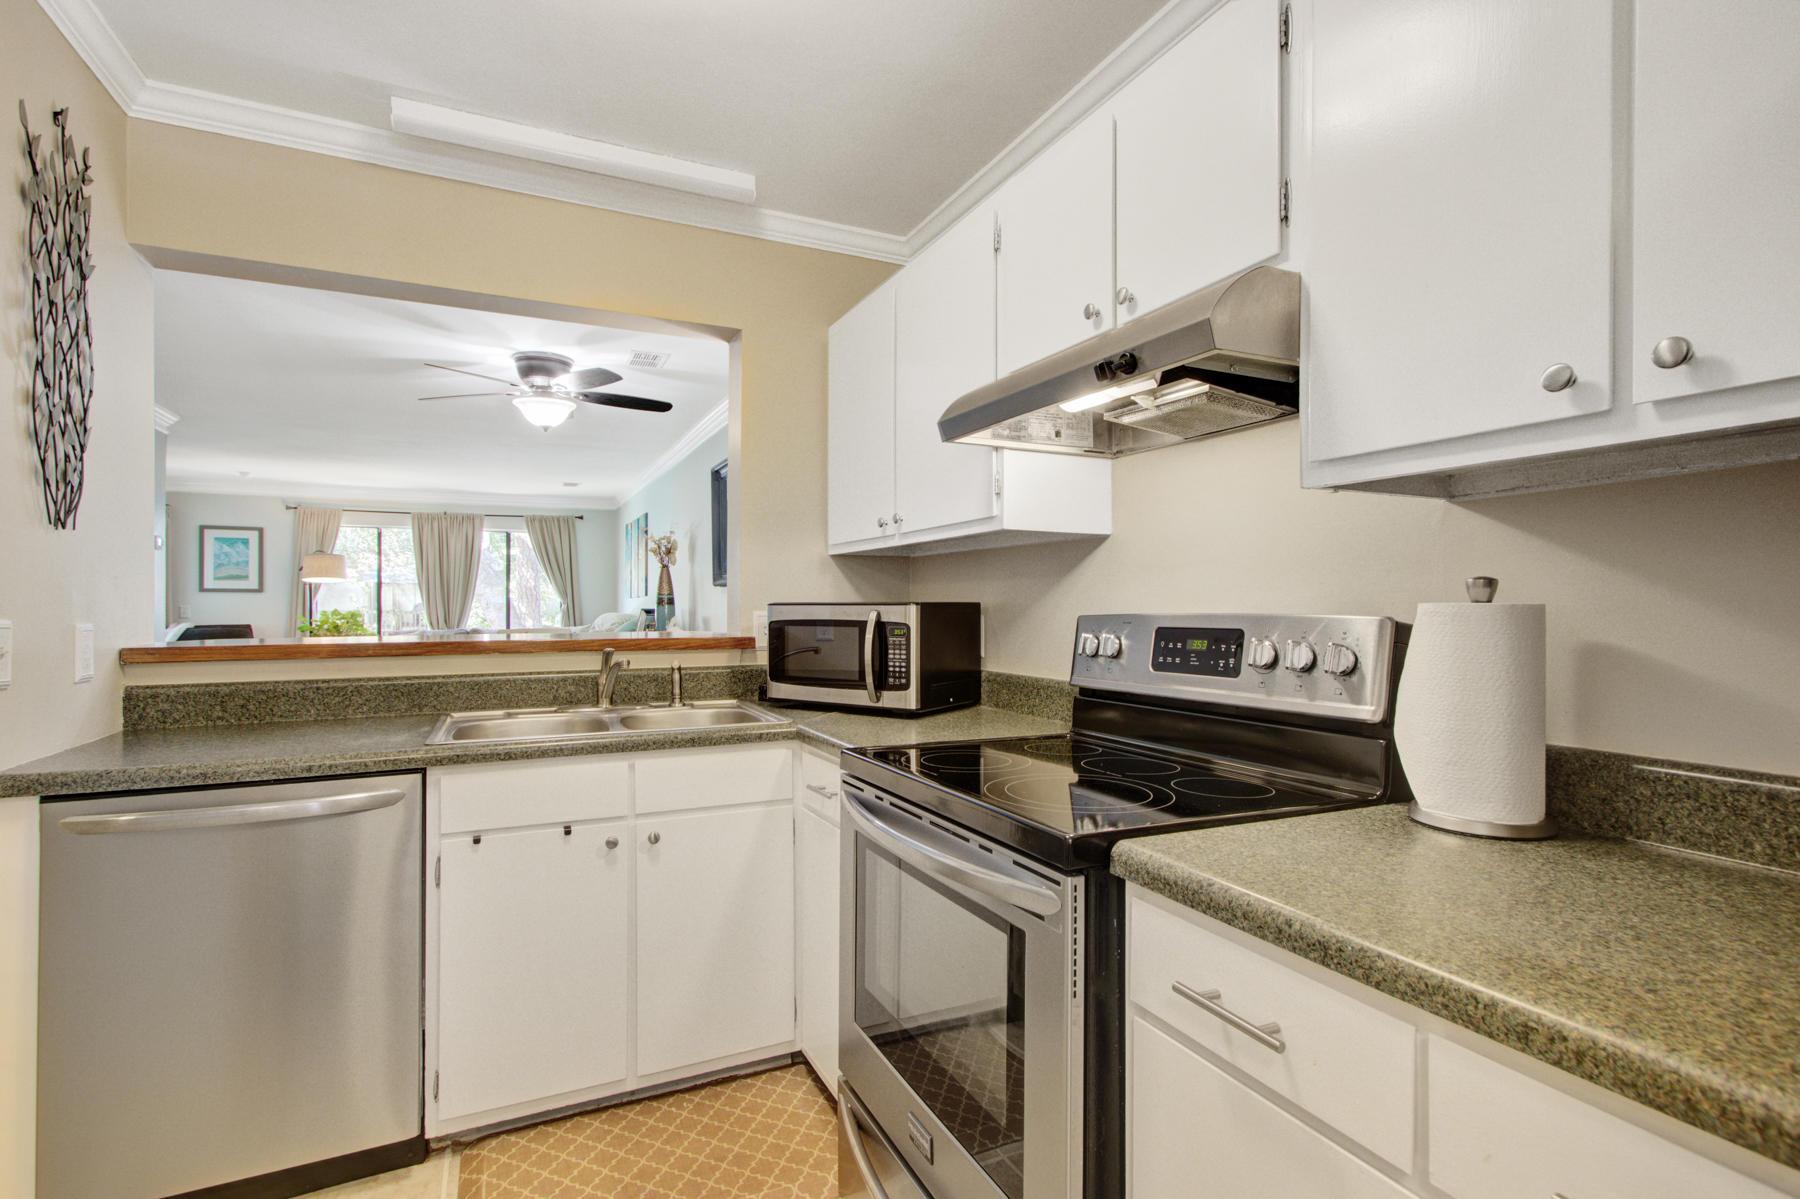 Snee Farm Lakes Homes For Sale - 1120 Hidden Cove, Mount Pleasant, SC - 22